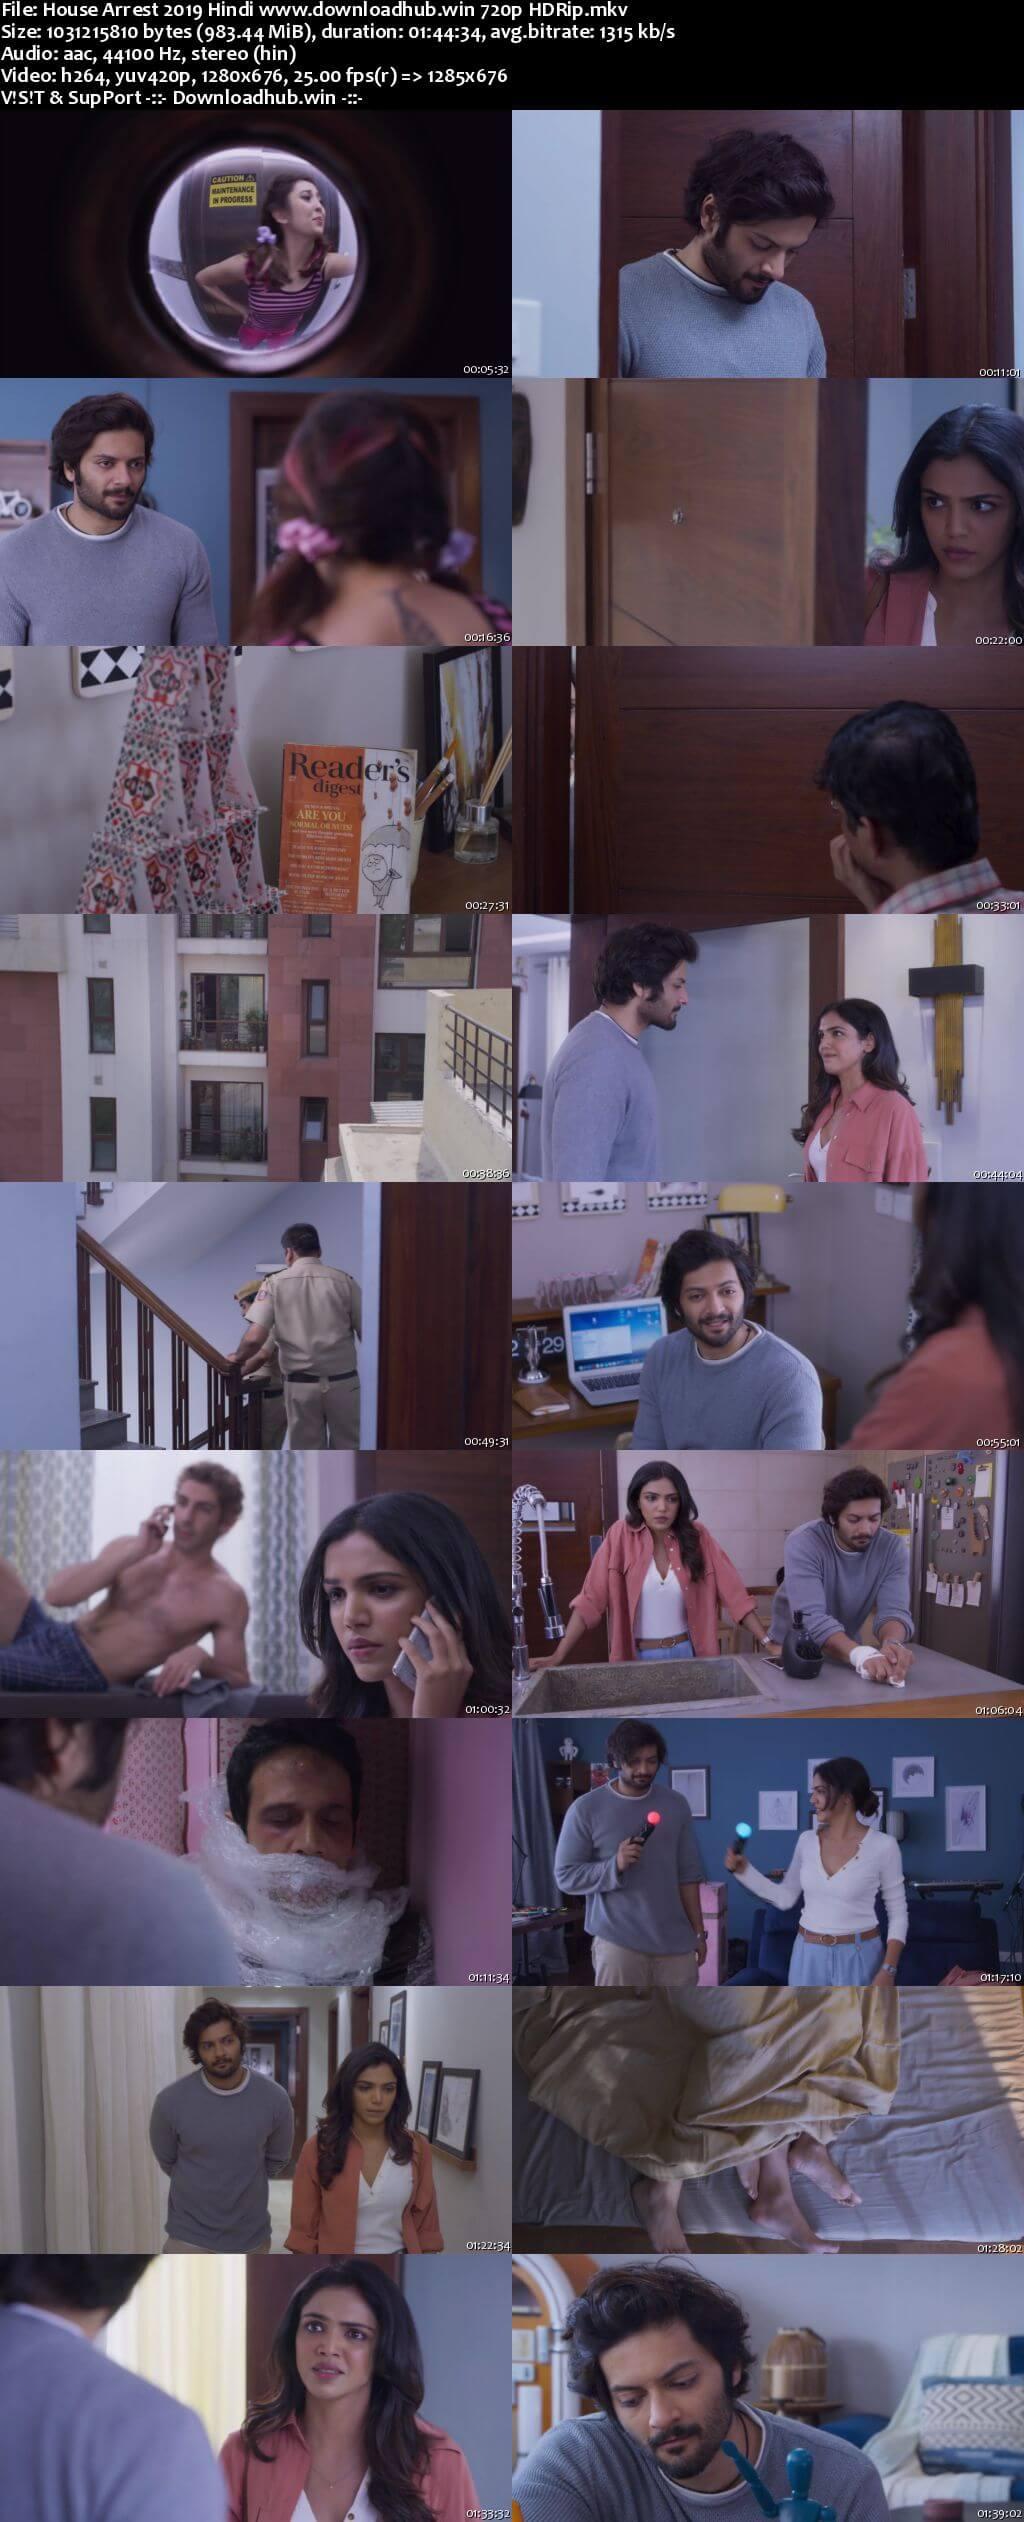 House Arrest 2019 Hindi 720p HDRip x264